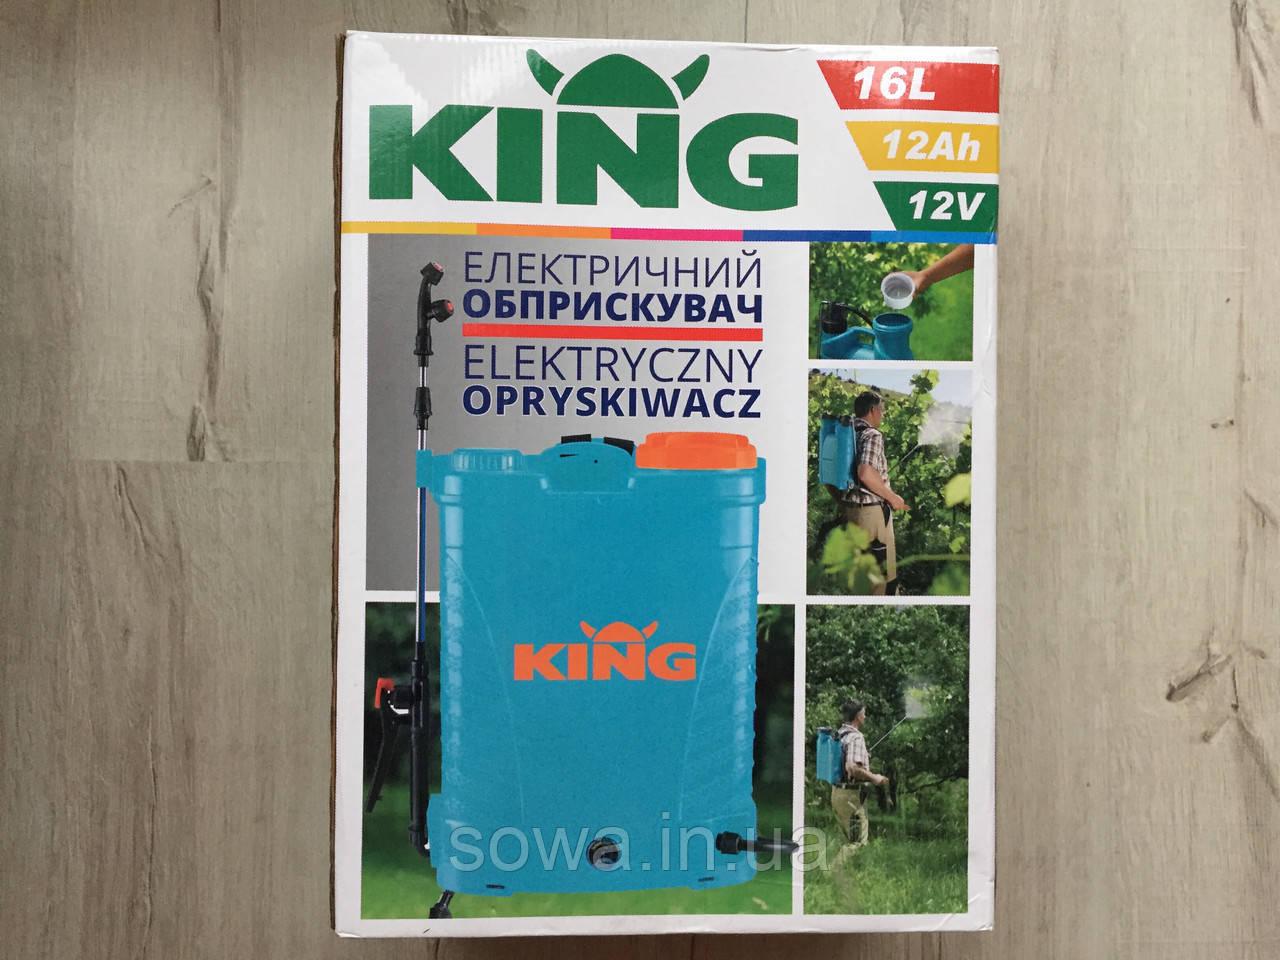 ✔️ Опрыскиватель Аккумуляторный  KING 16L, 12Ач, 5,5МПа